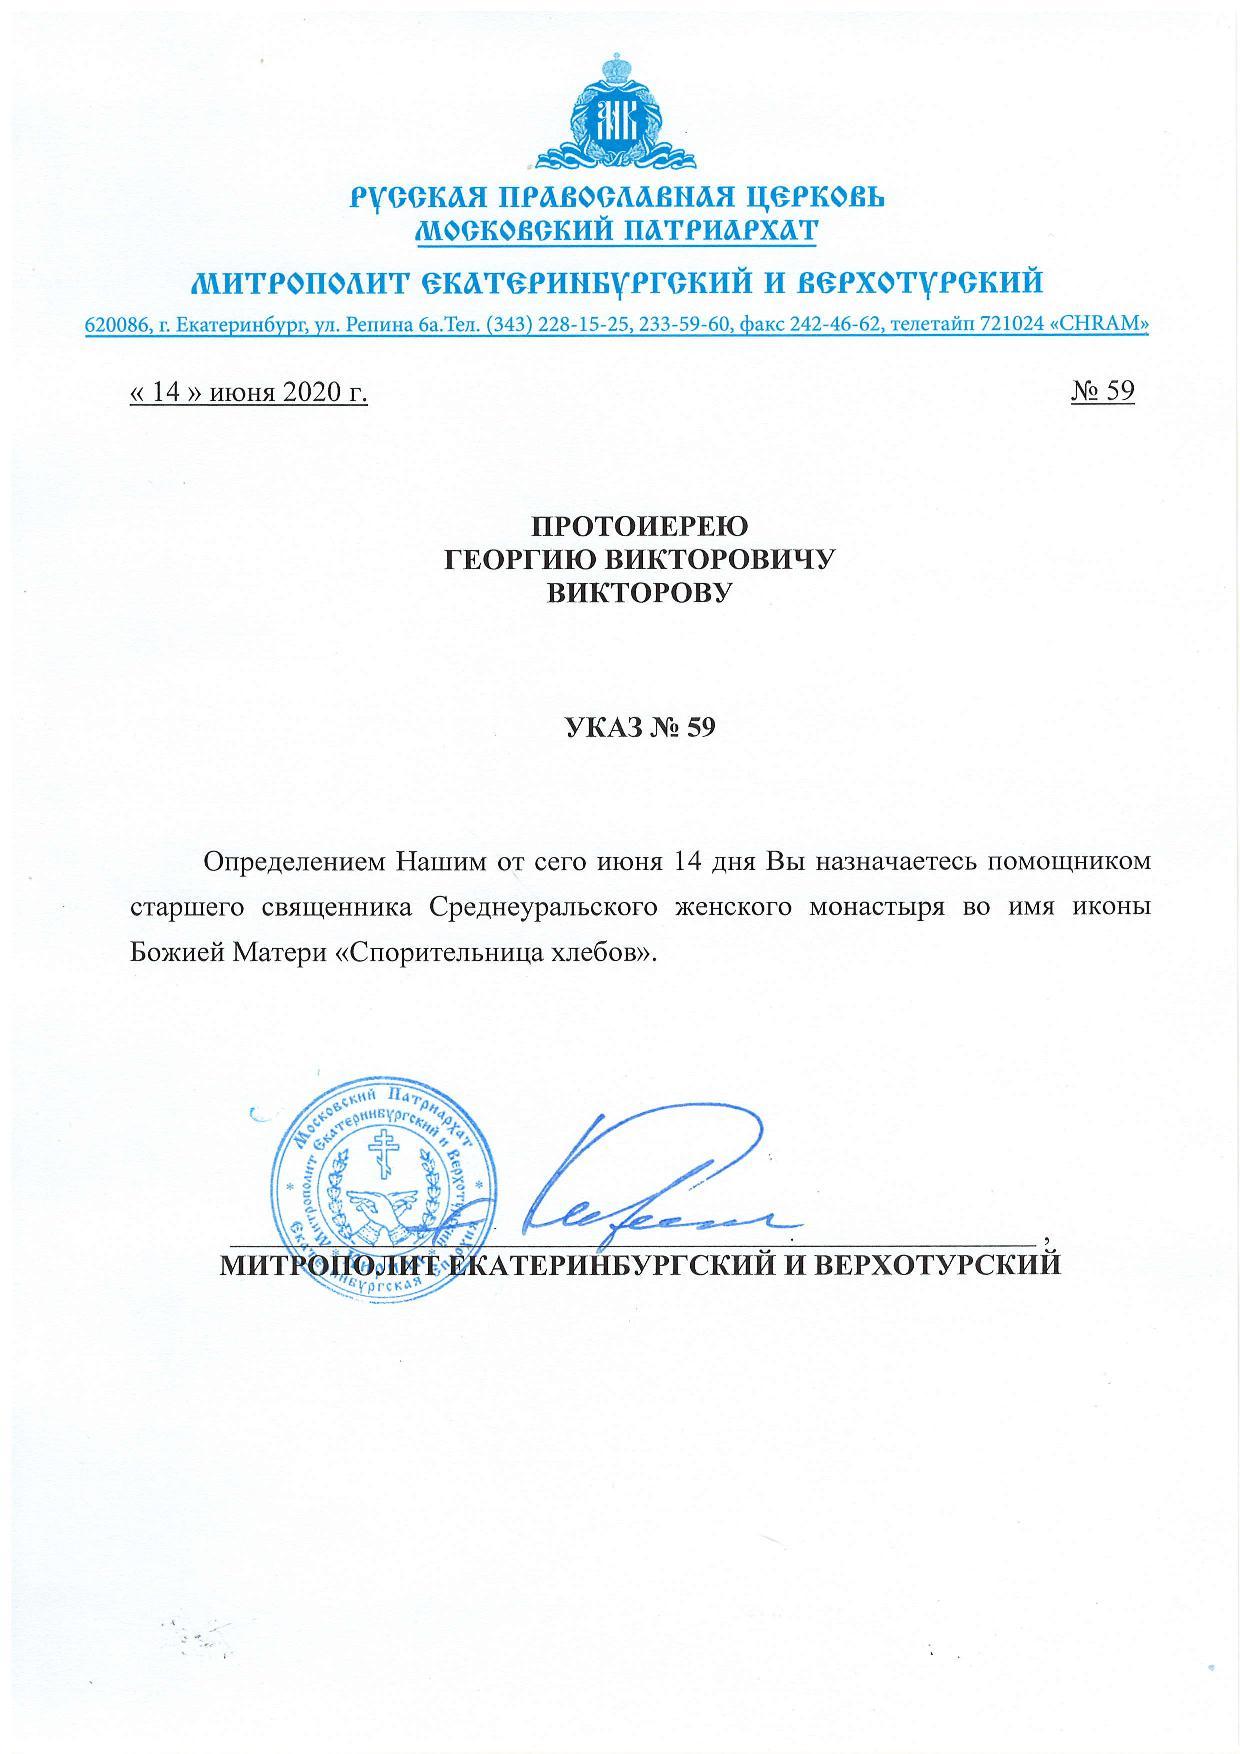 Документ подписал митрополит Кирилл